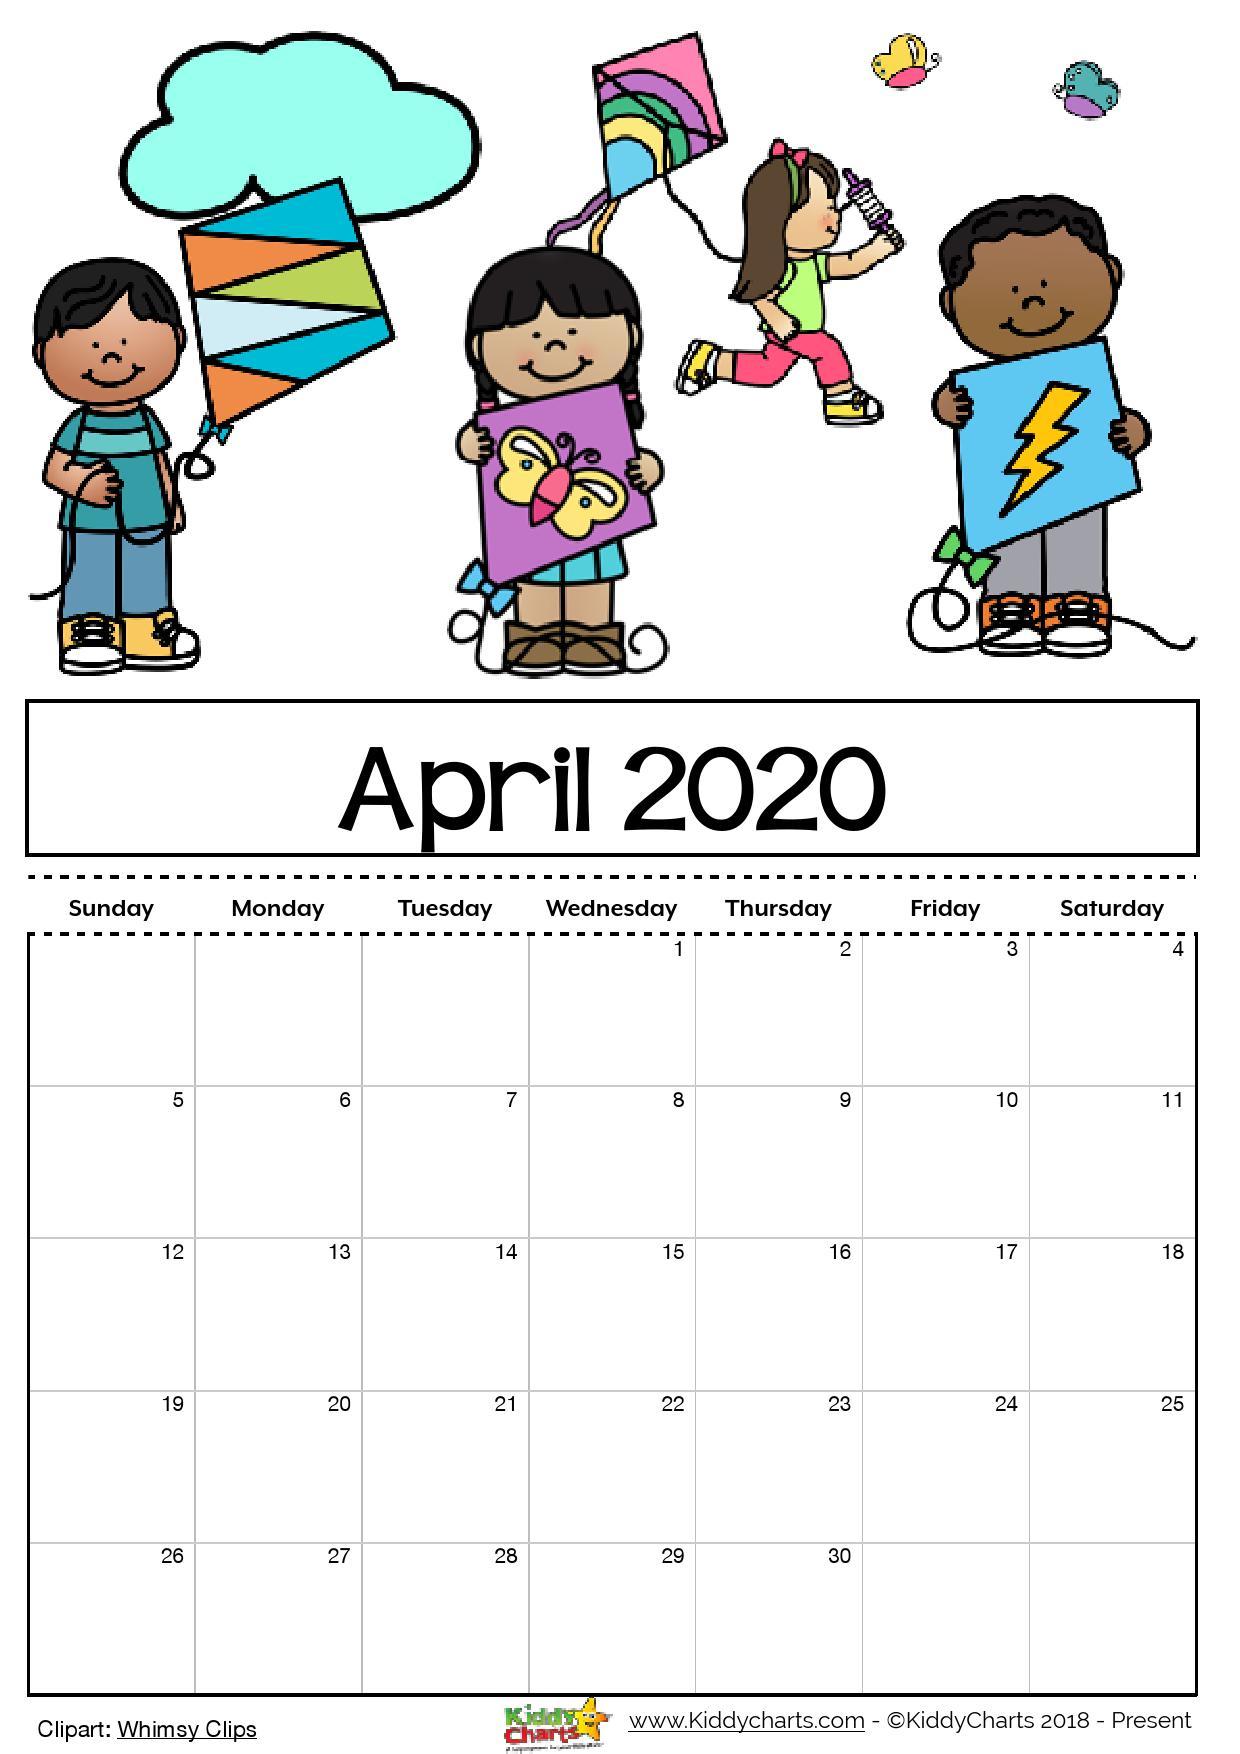 Free Printable Calendar For Kids Including An